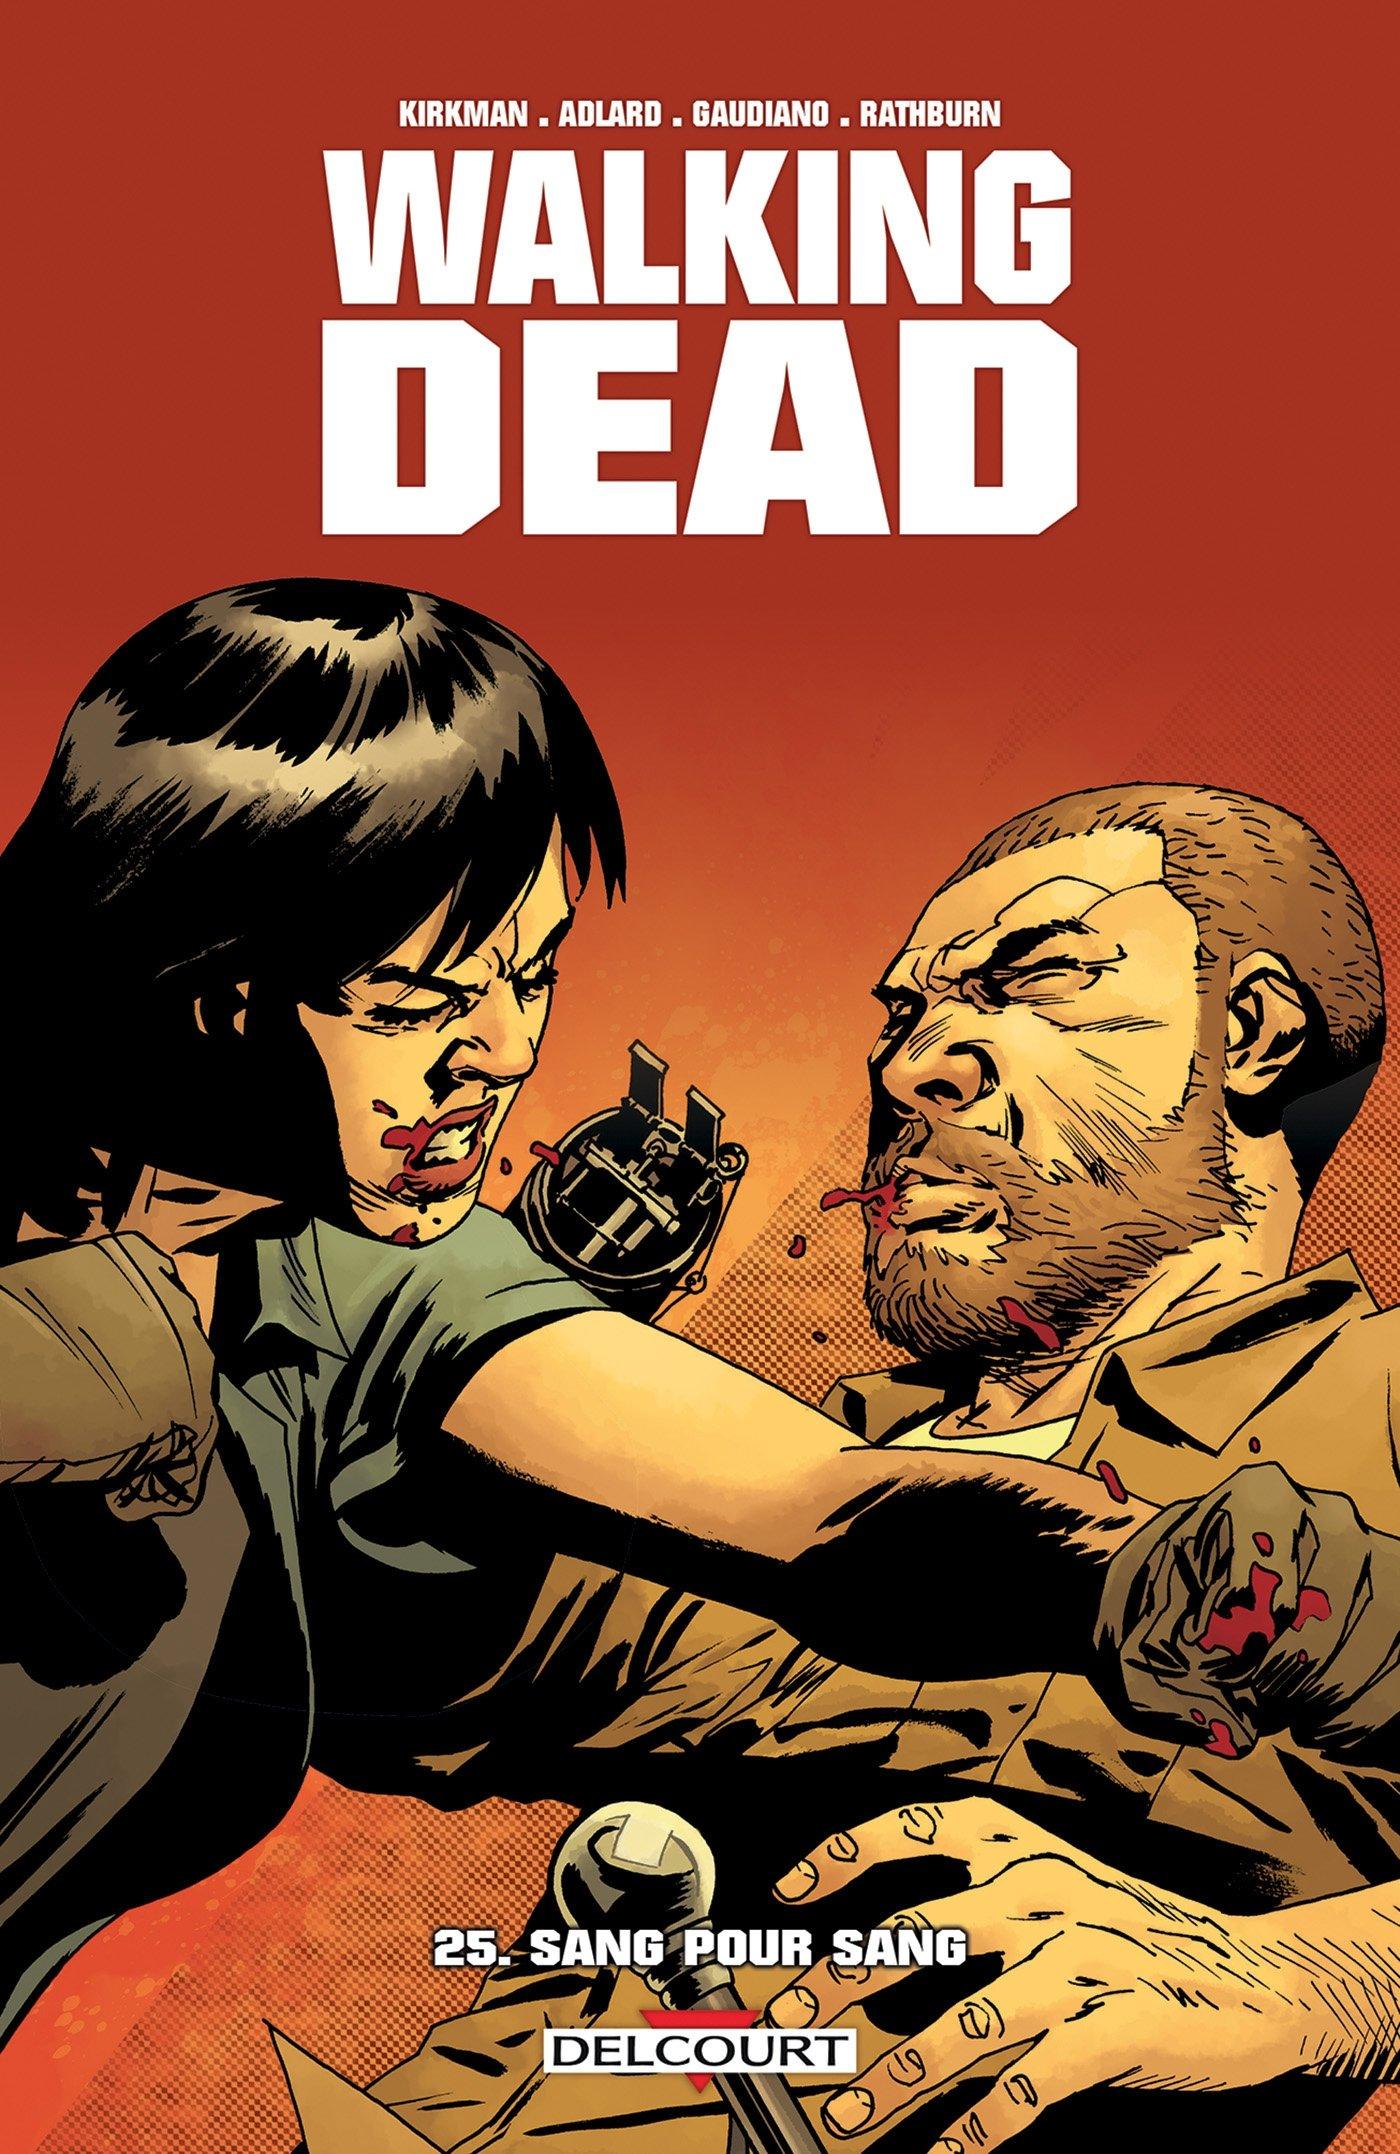 Walking Dead 25 Sang pour sang Broché – 30 mars 2016 Robert Kirkman Stefano Gaudiano Charlie Adlard Delcourt